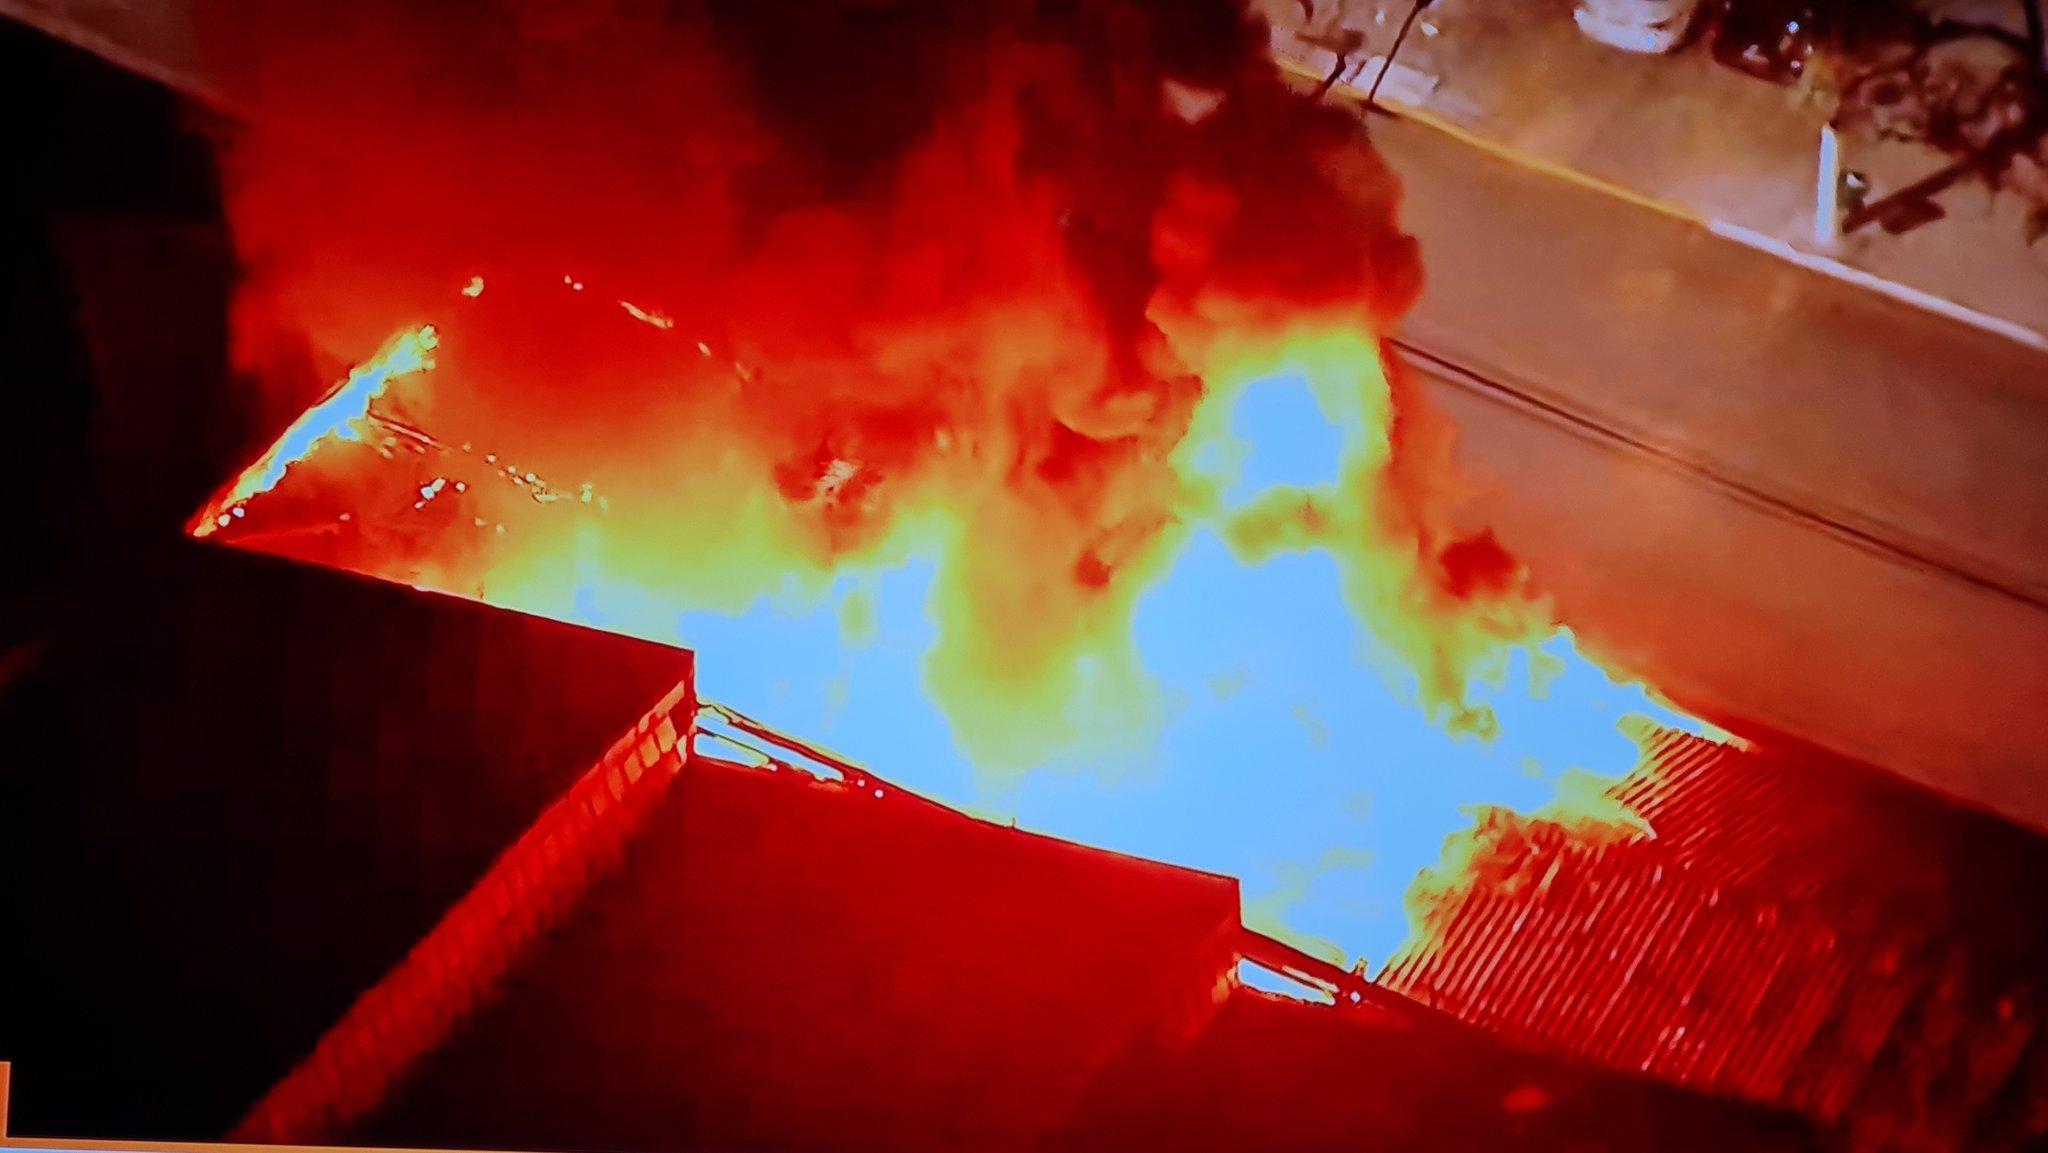 Incêndio atinge a unidade da Cinemateca na Vila Leopoldina, na Zona Oeste de SP